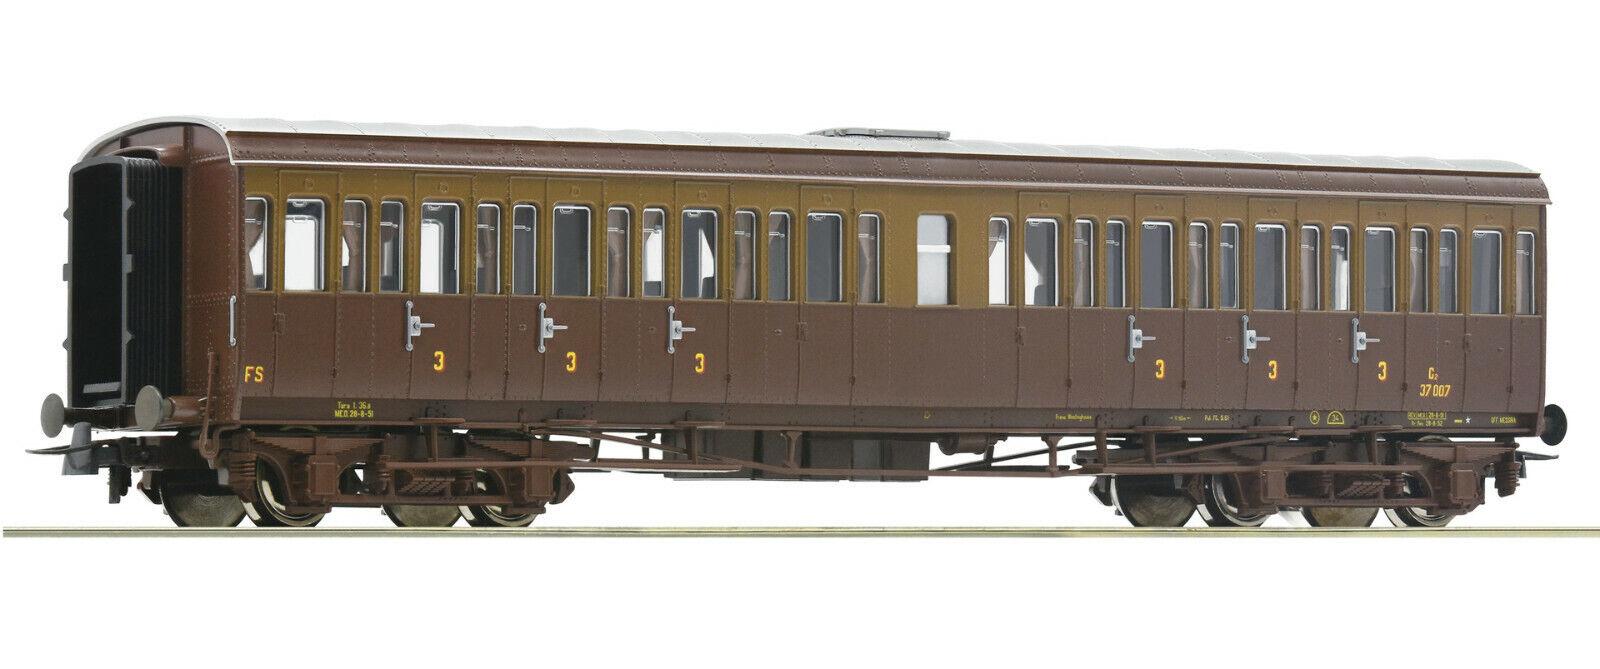 ROCO h0 74686vetture passeggeri 3. classee, FS, ep. III Merce Nuova